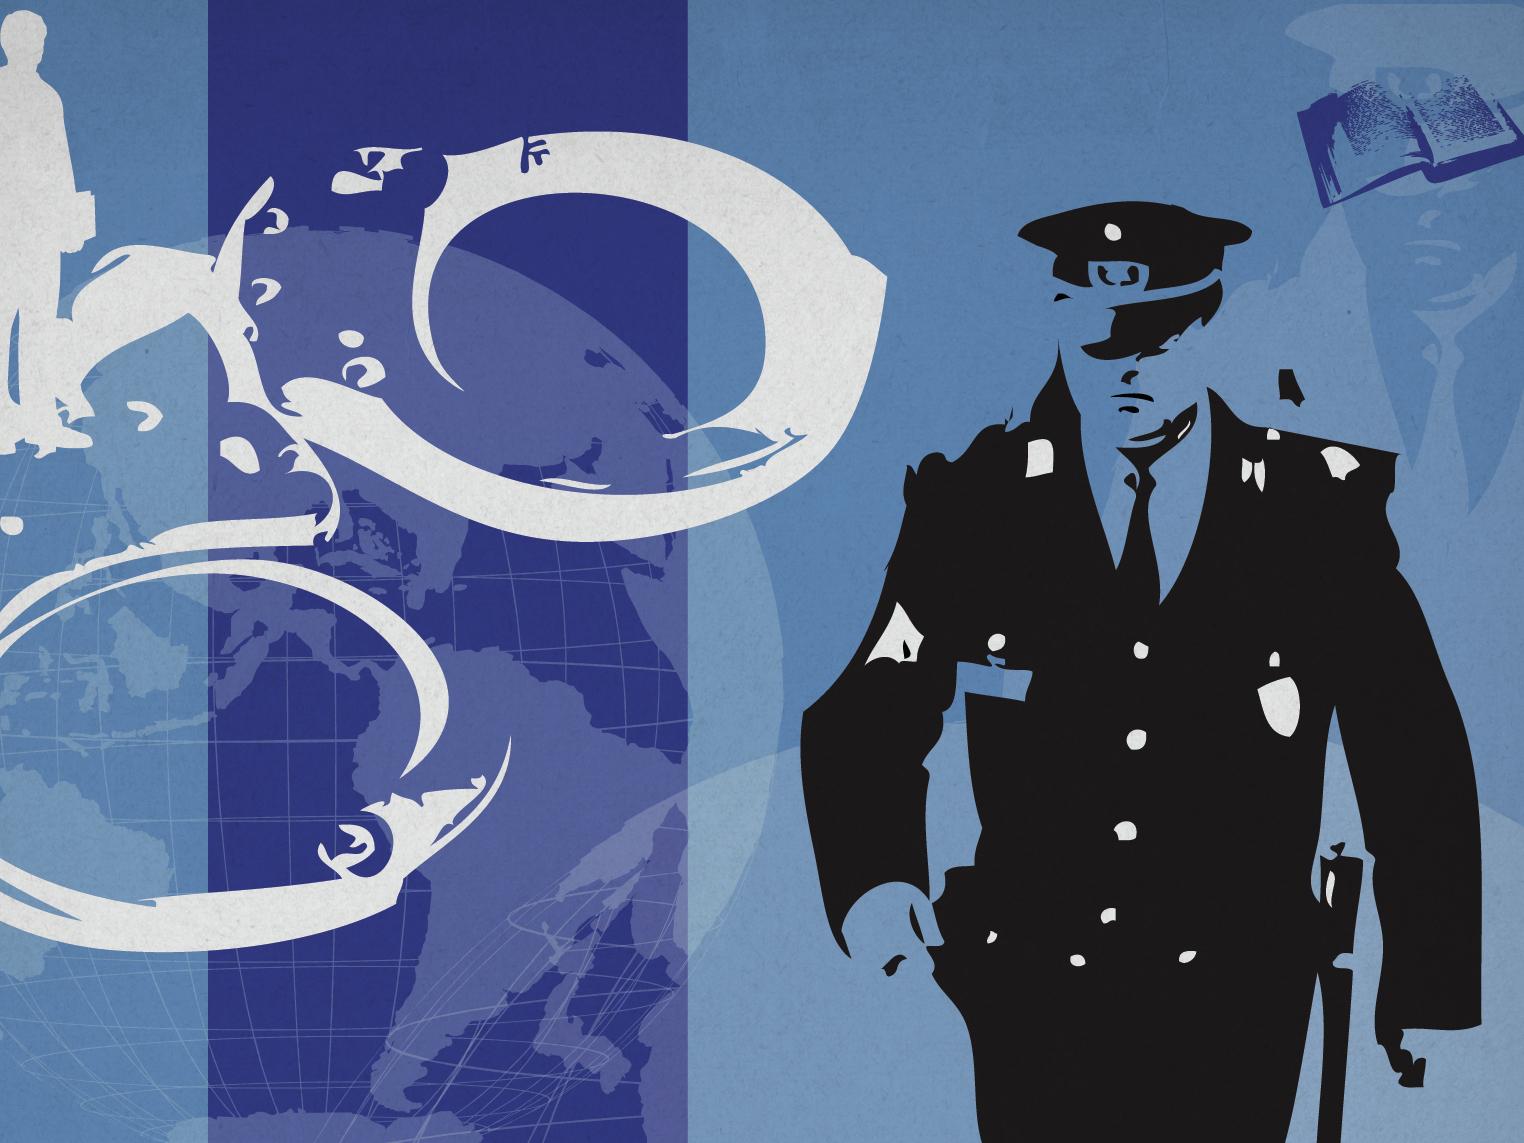 TRUMP REPORT: SECURITY AND PROPAGANDA cover image